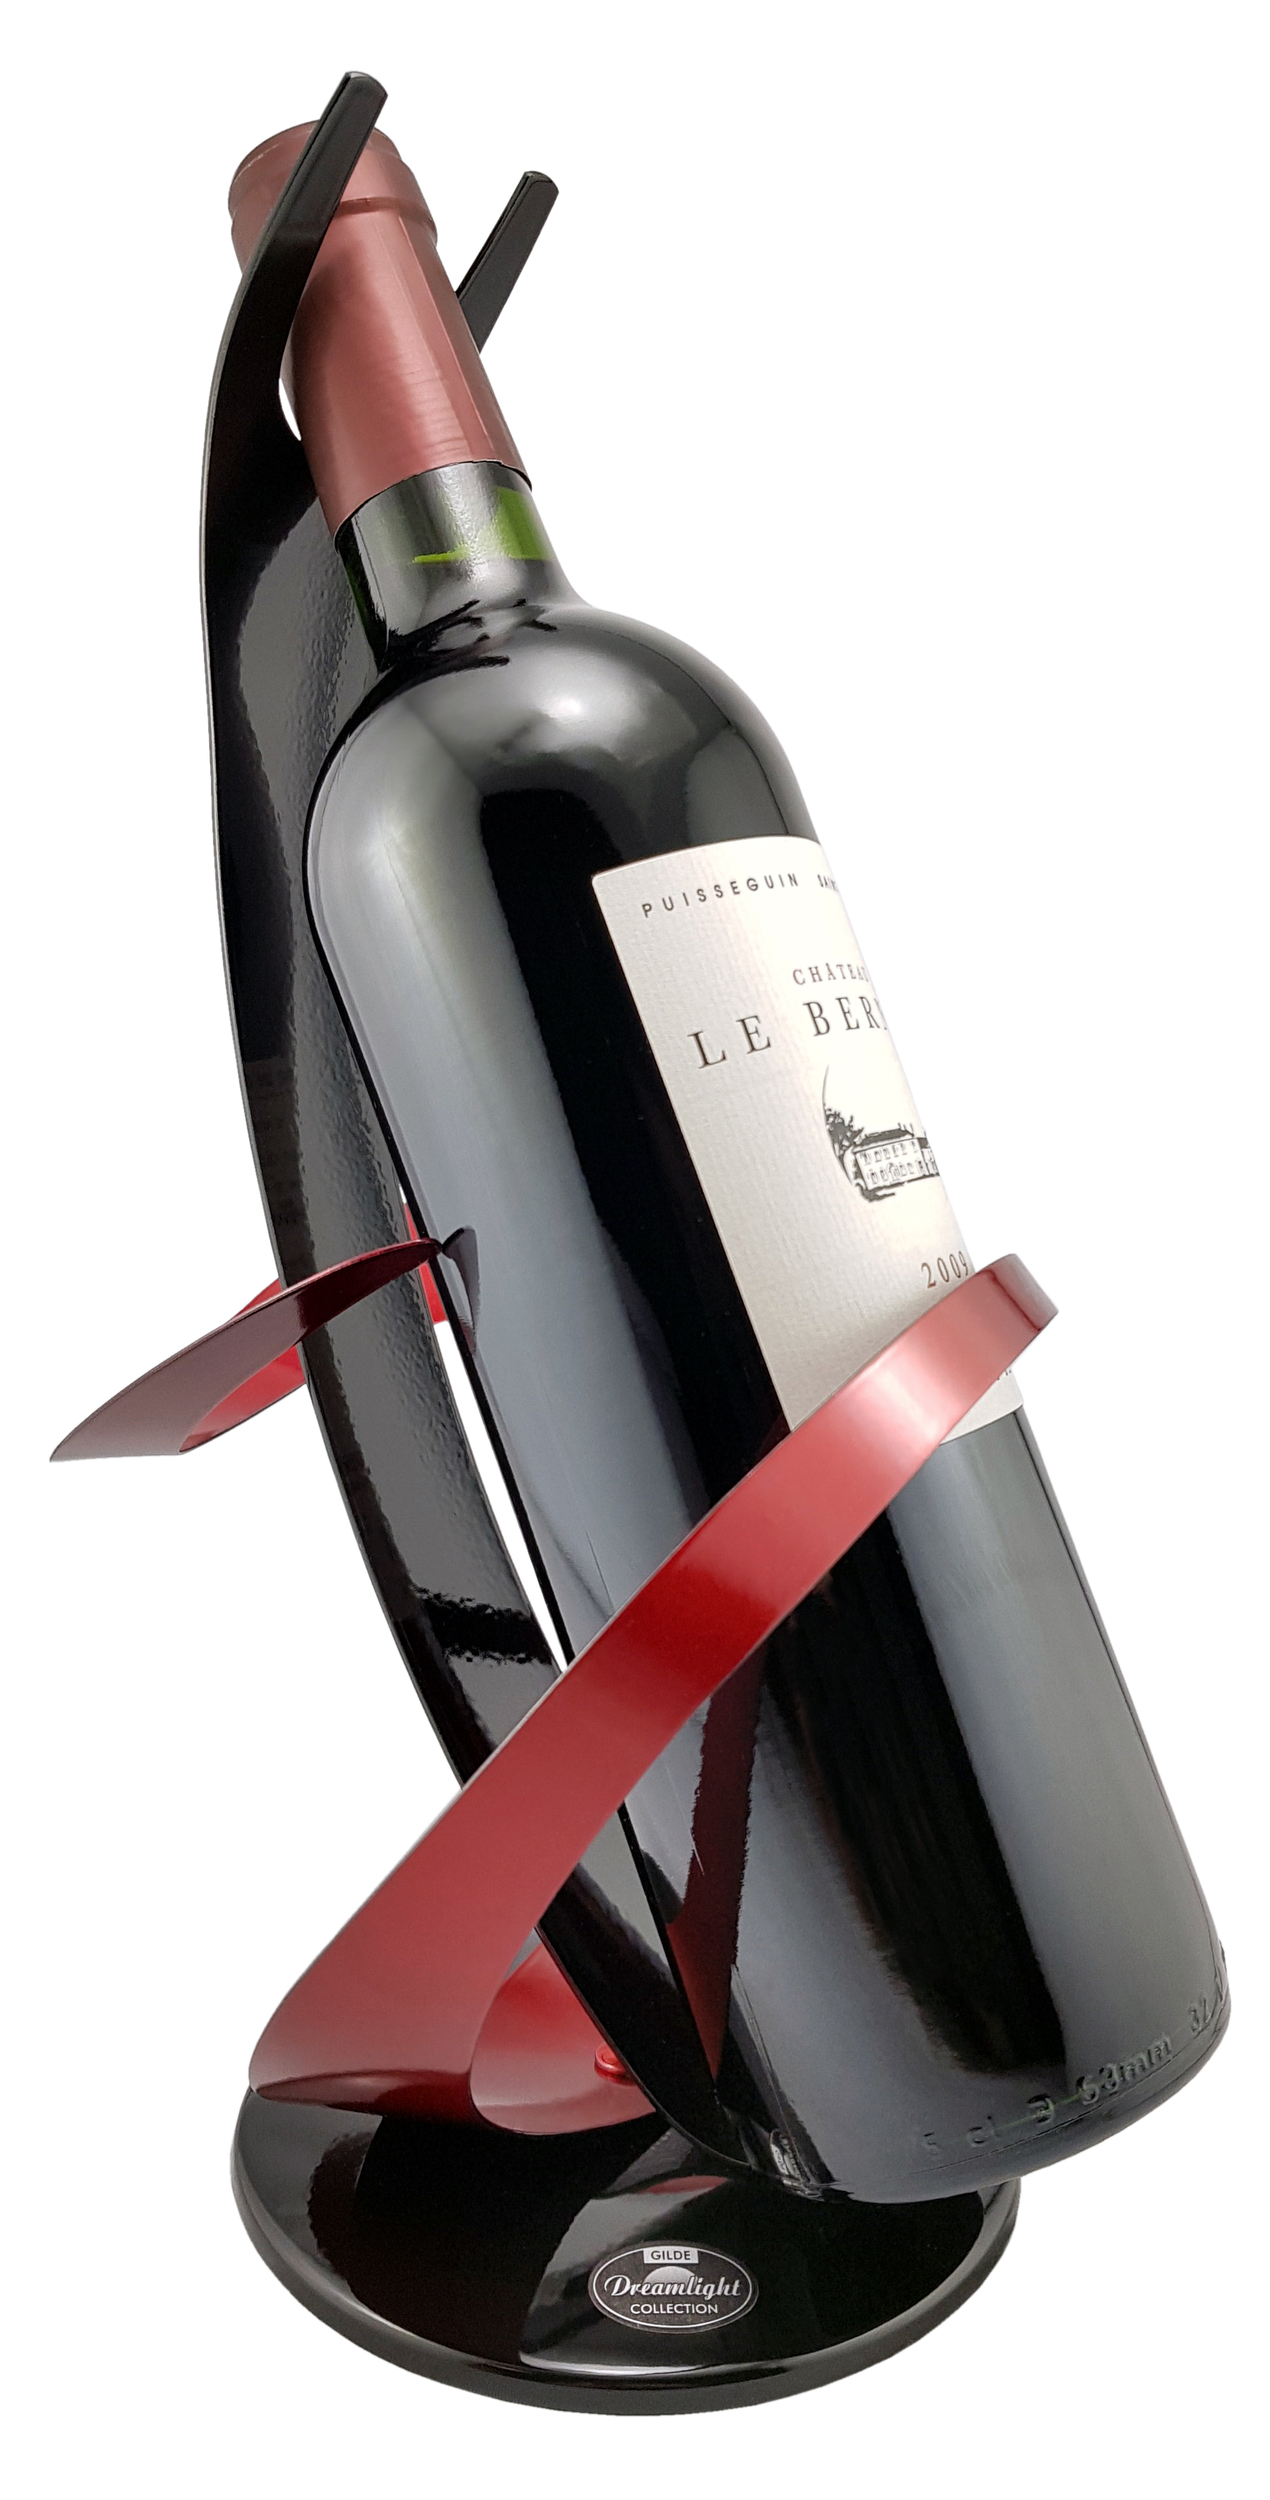 Porte bouteille design Ref 302 a